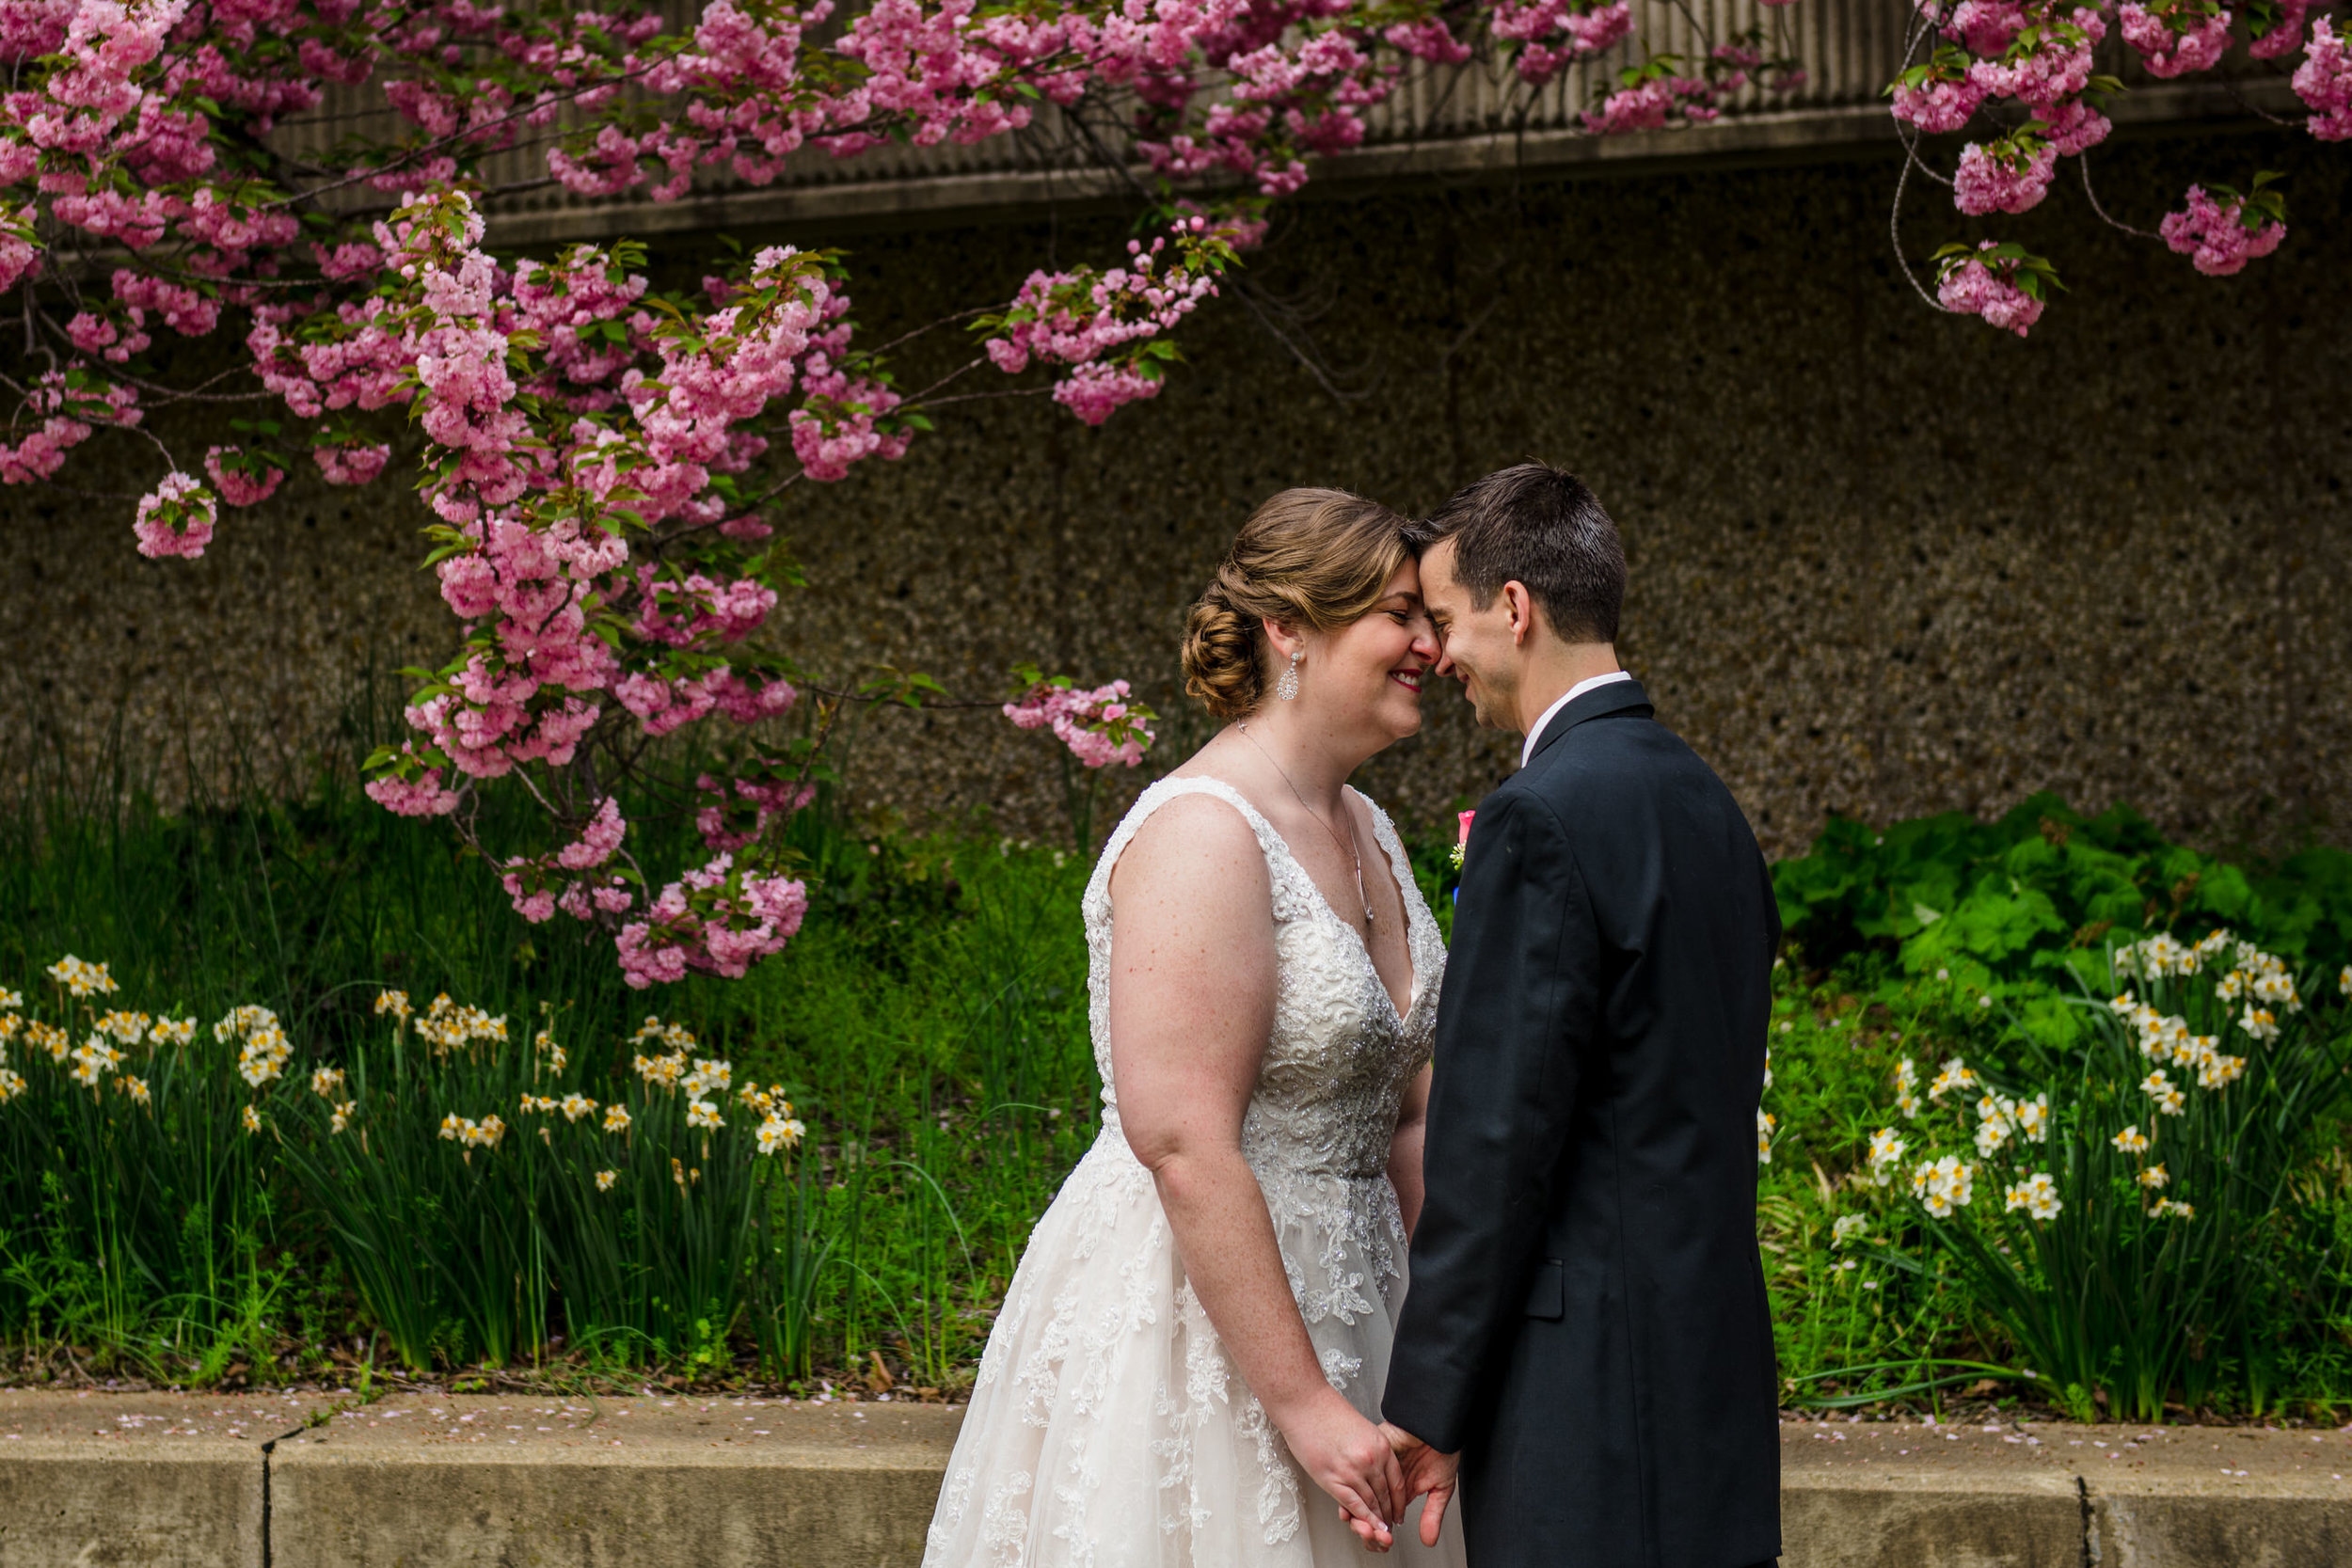 MarriottDC-Sarah&Sasha-WeddingParty-9195.jpg